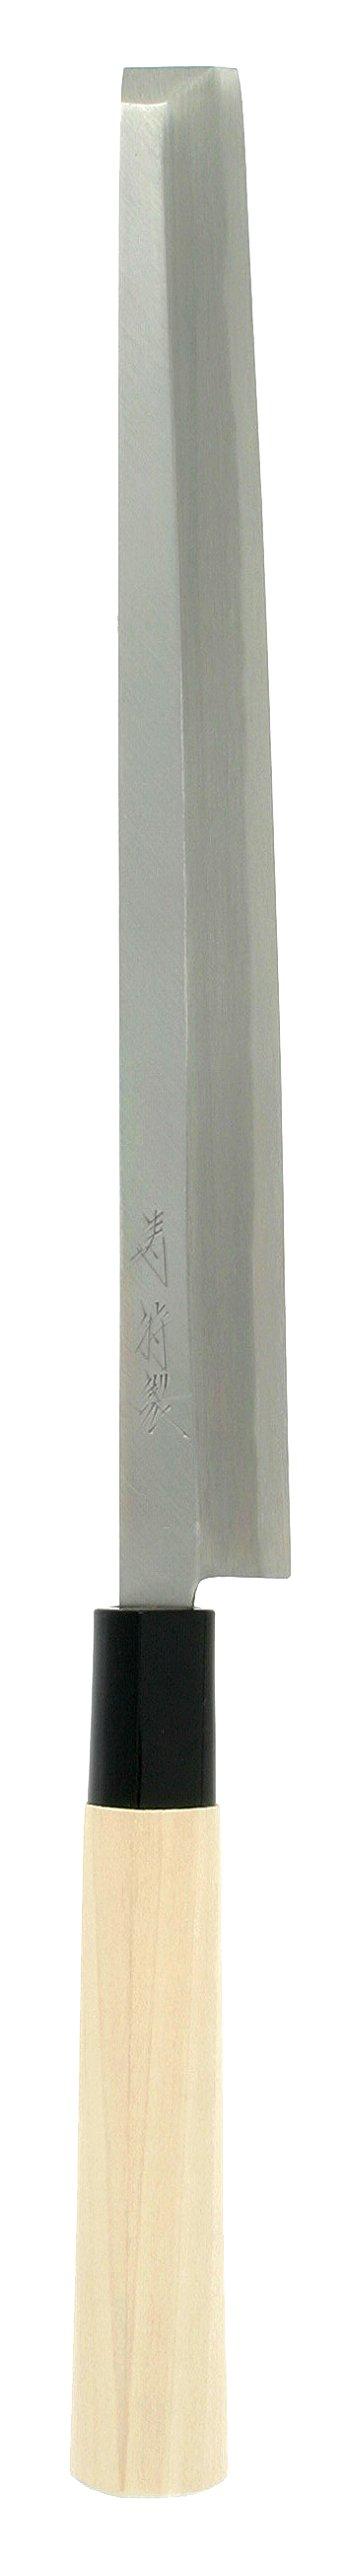 Kotobuki High Carbon Japanese Takobiki Sashimi Knife, 240mm, Silver by Kotobuki